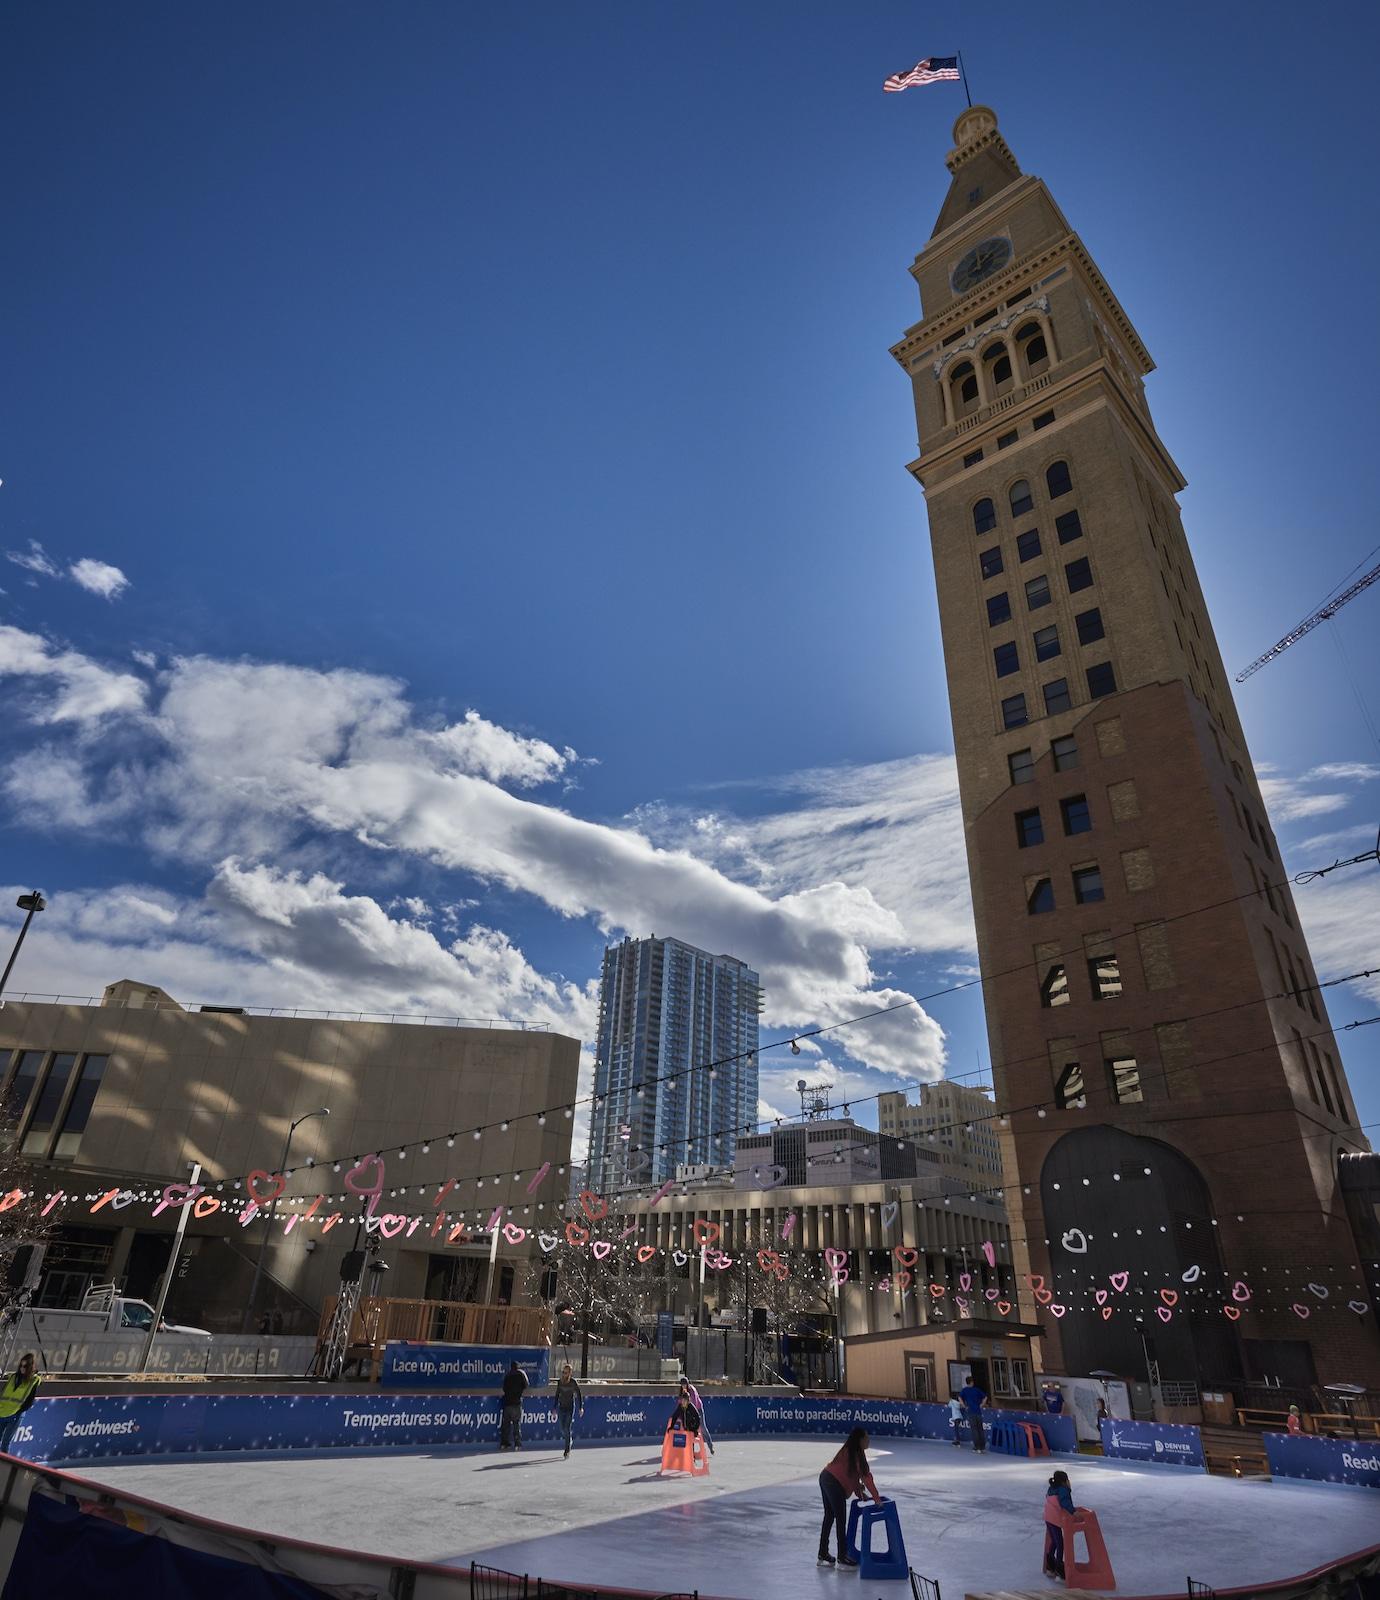 Downtown Denver Ice Rink Skyline Park Clocktower